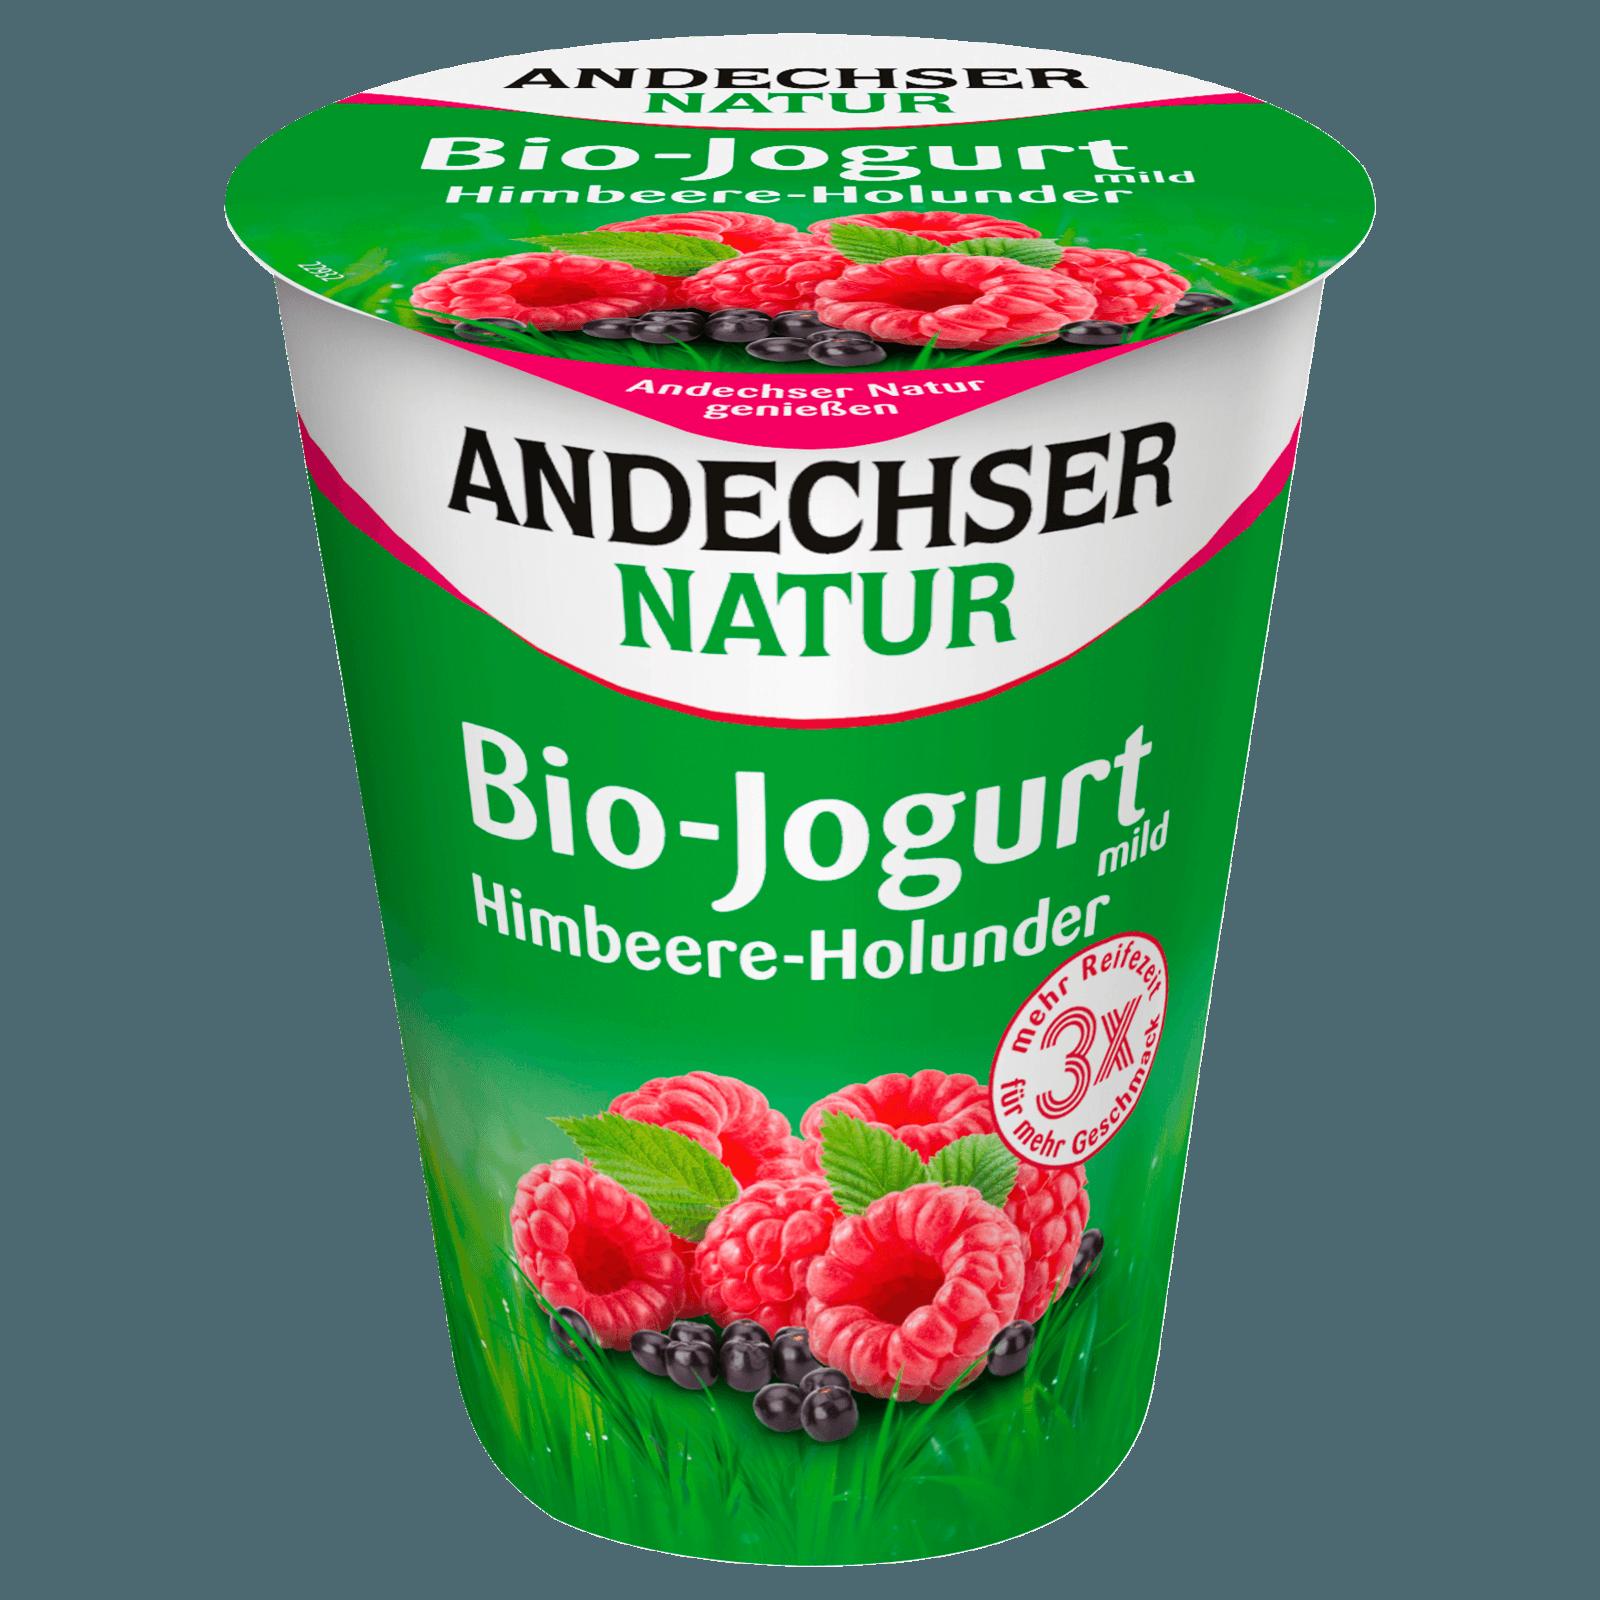 Andechser Natur Bio-Jogurt mild Himbeer-Holunder 400g